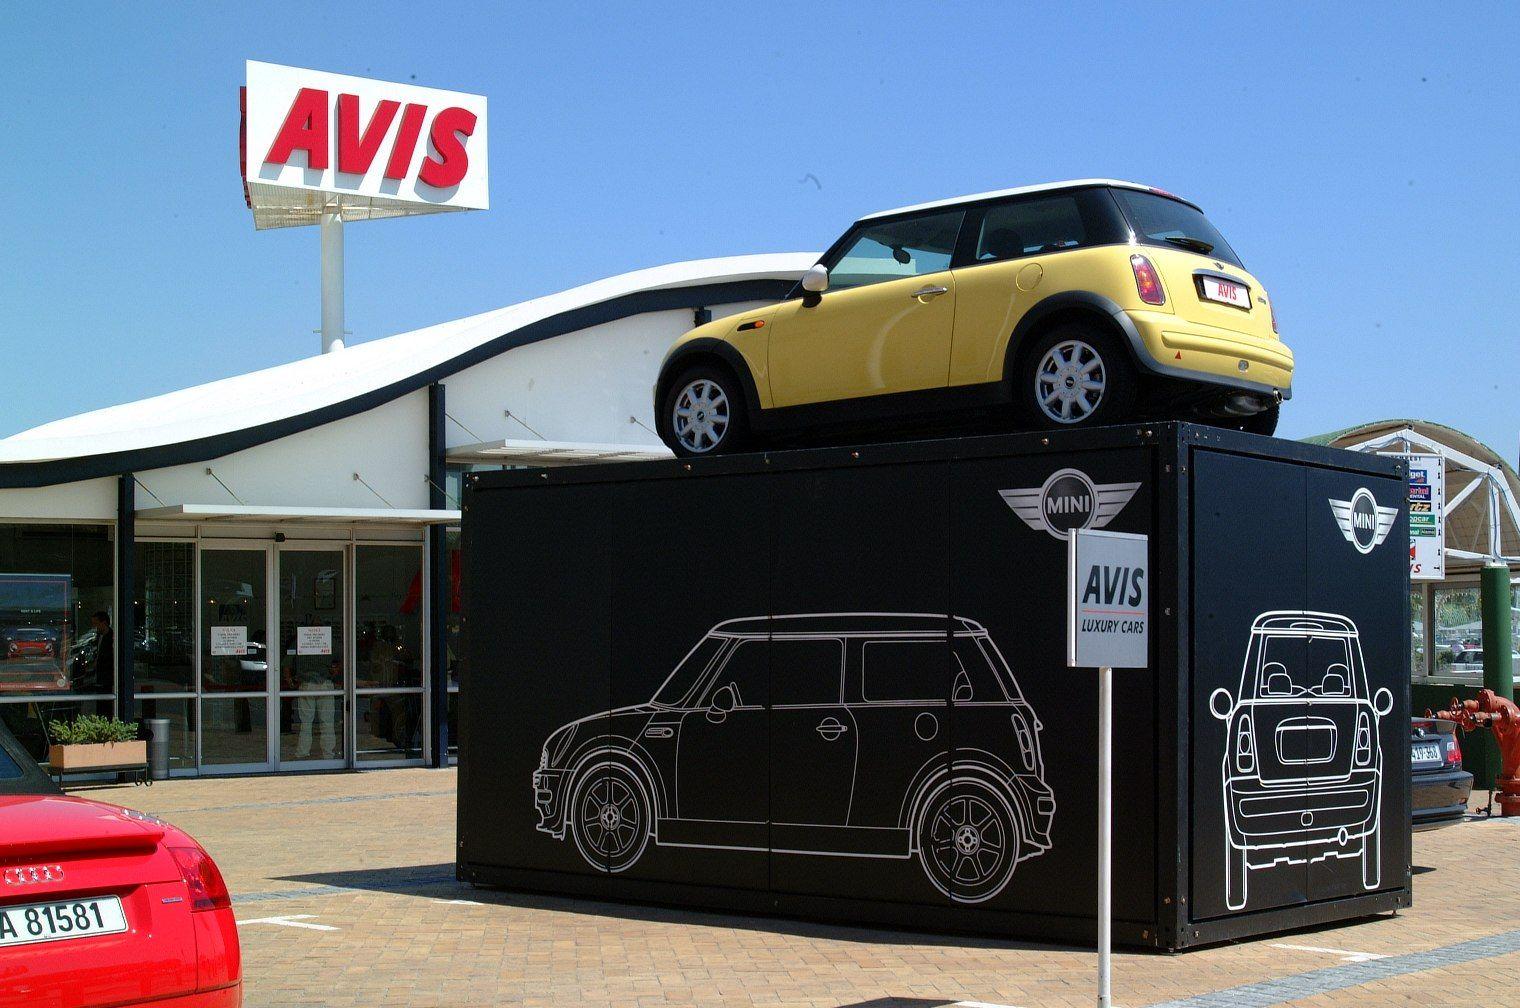 Avis Car Hire, Cape Town Car hire, Car rental, Holiday car